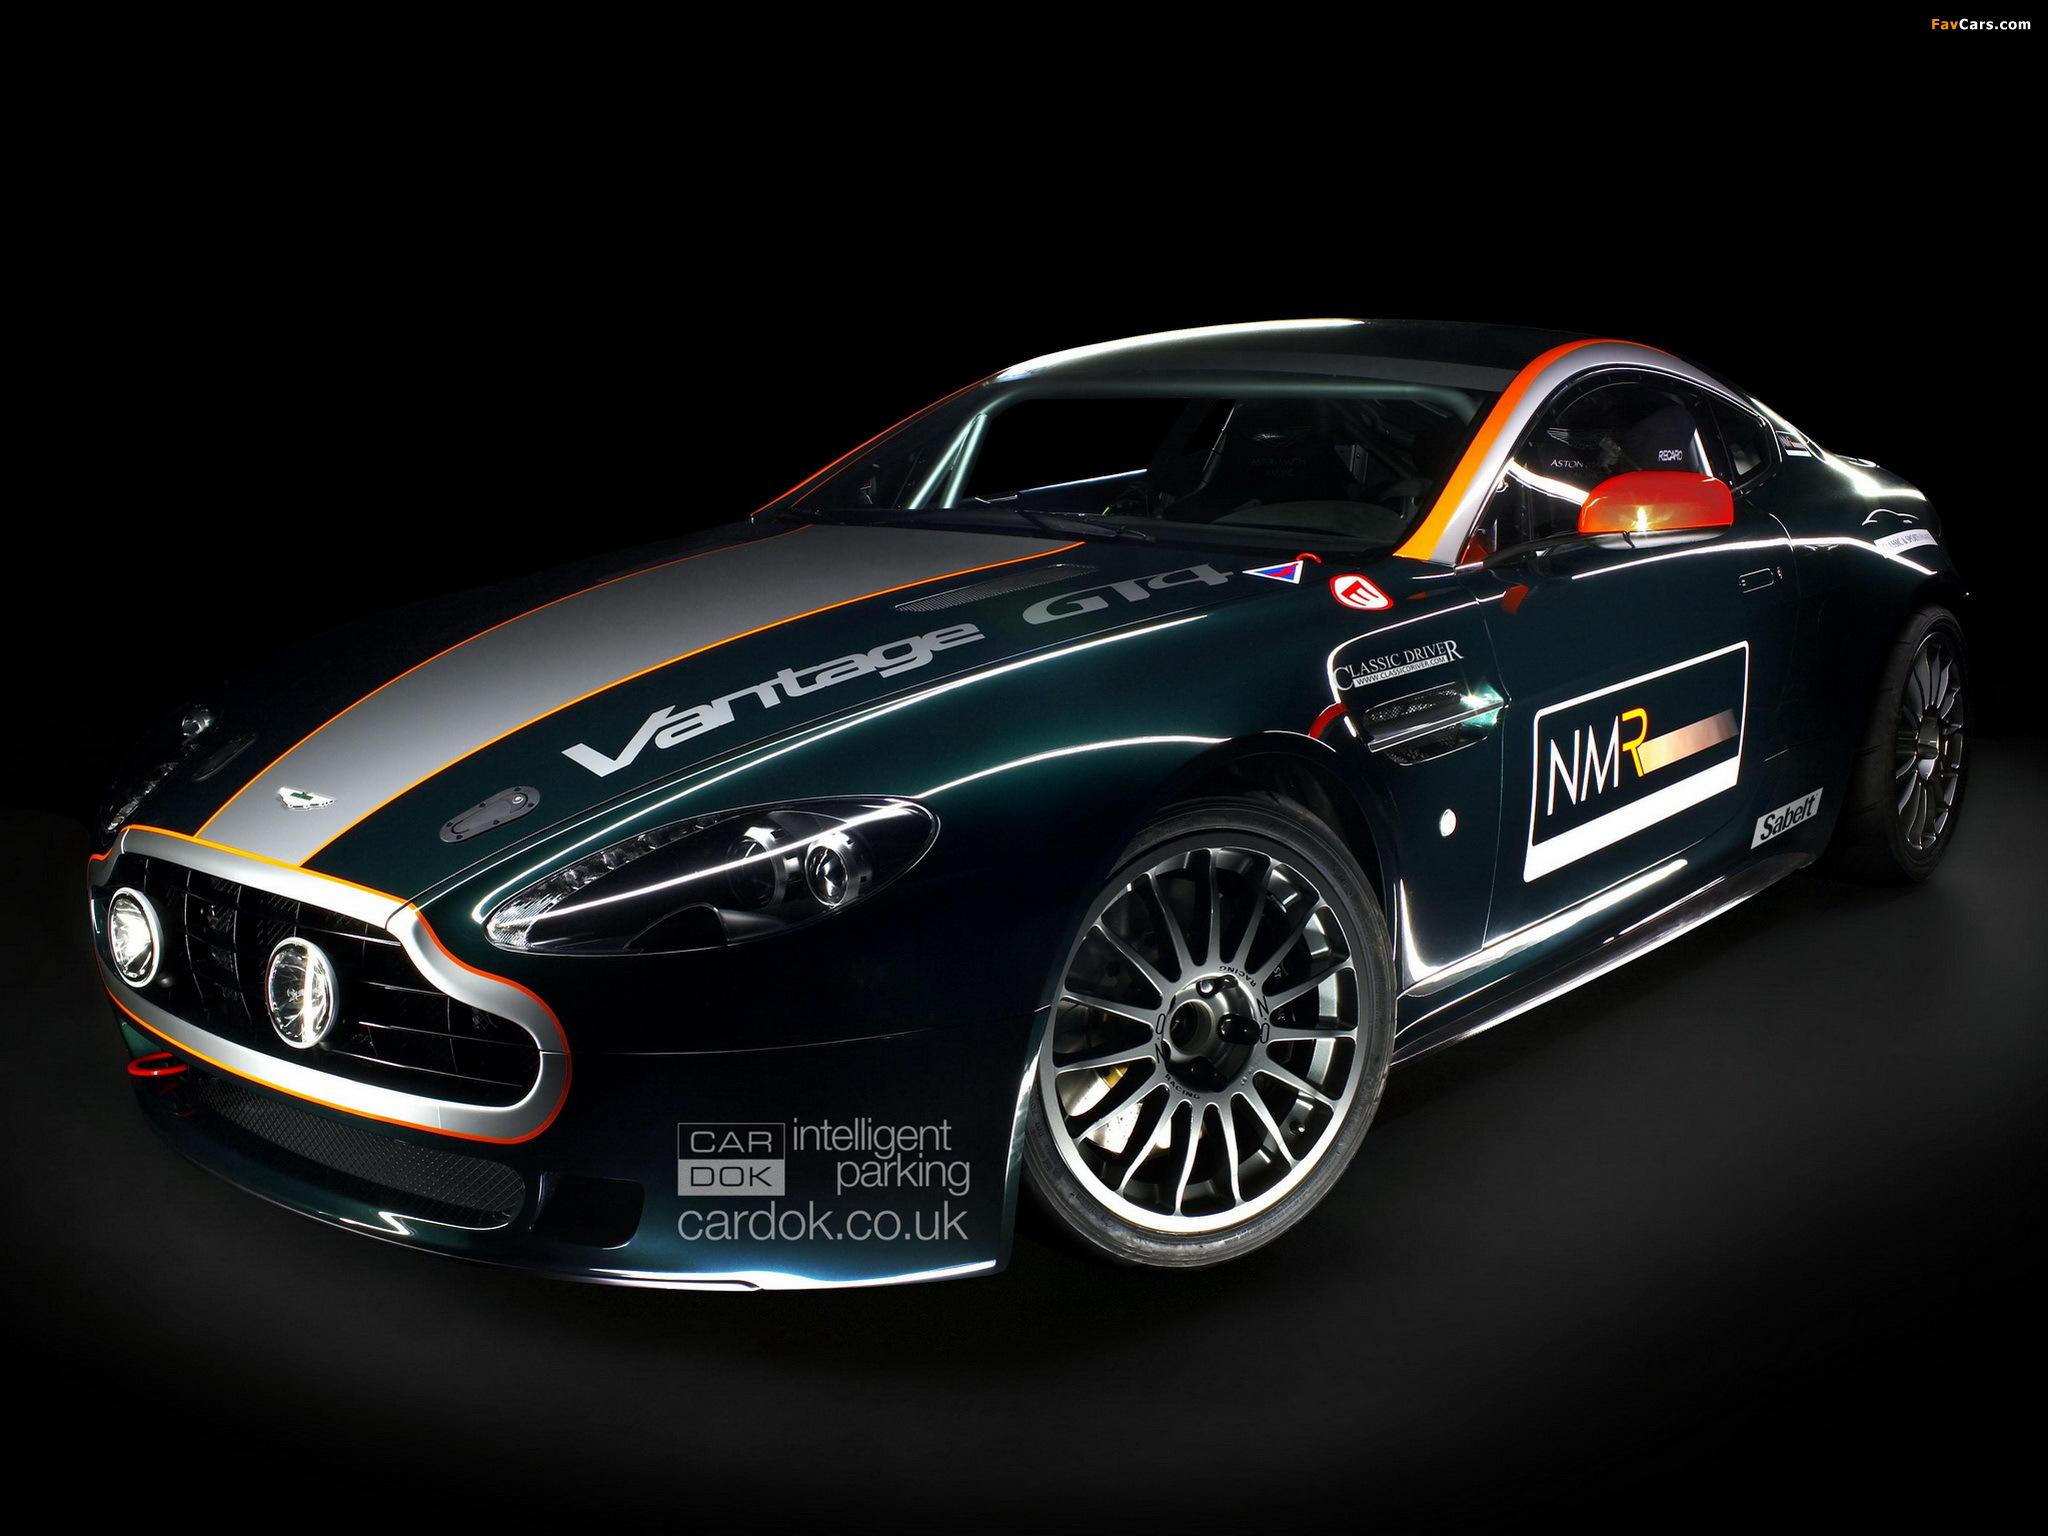 HQ Aston Martin Vantage GT4 Wallpapers | File 504.19Kb